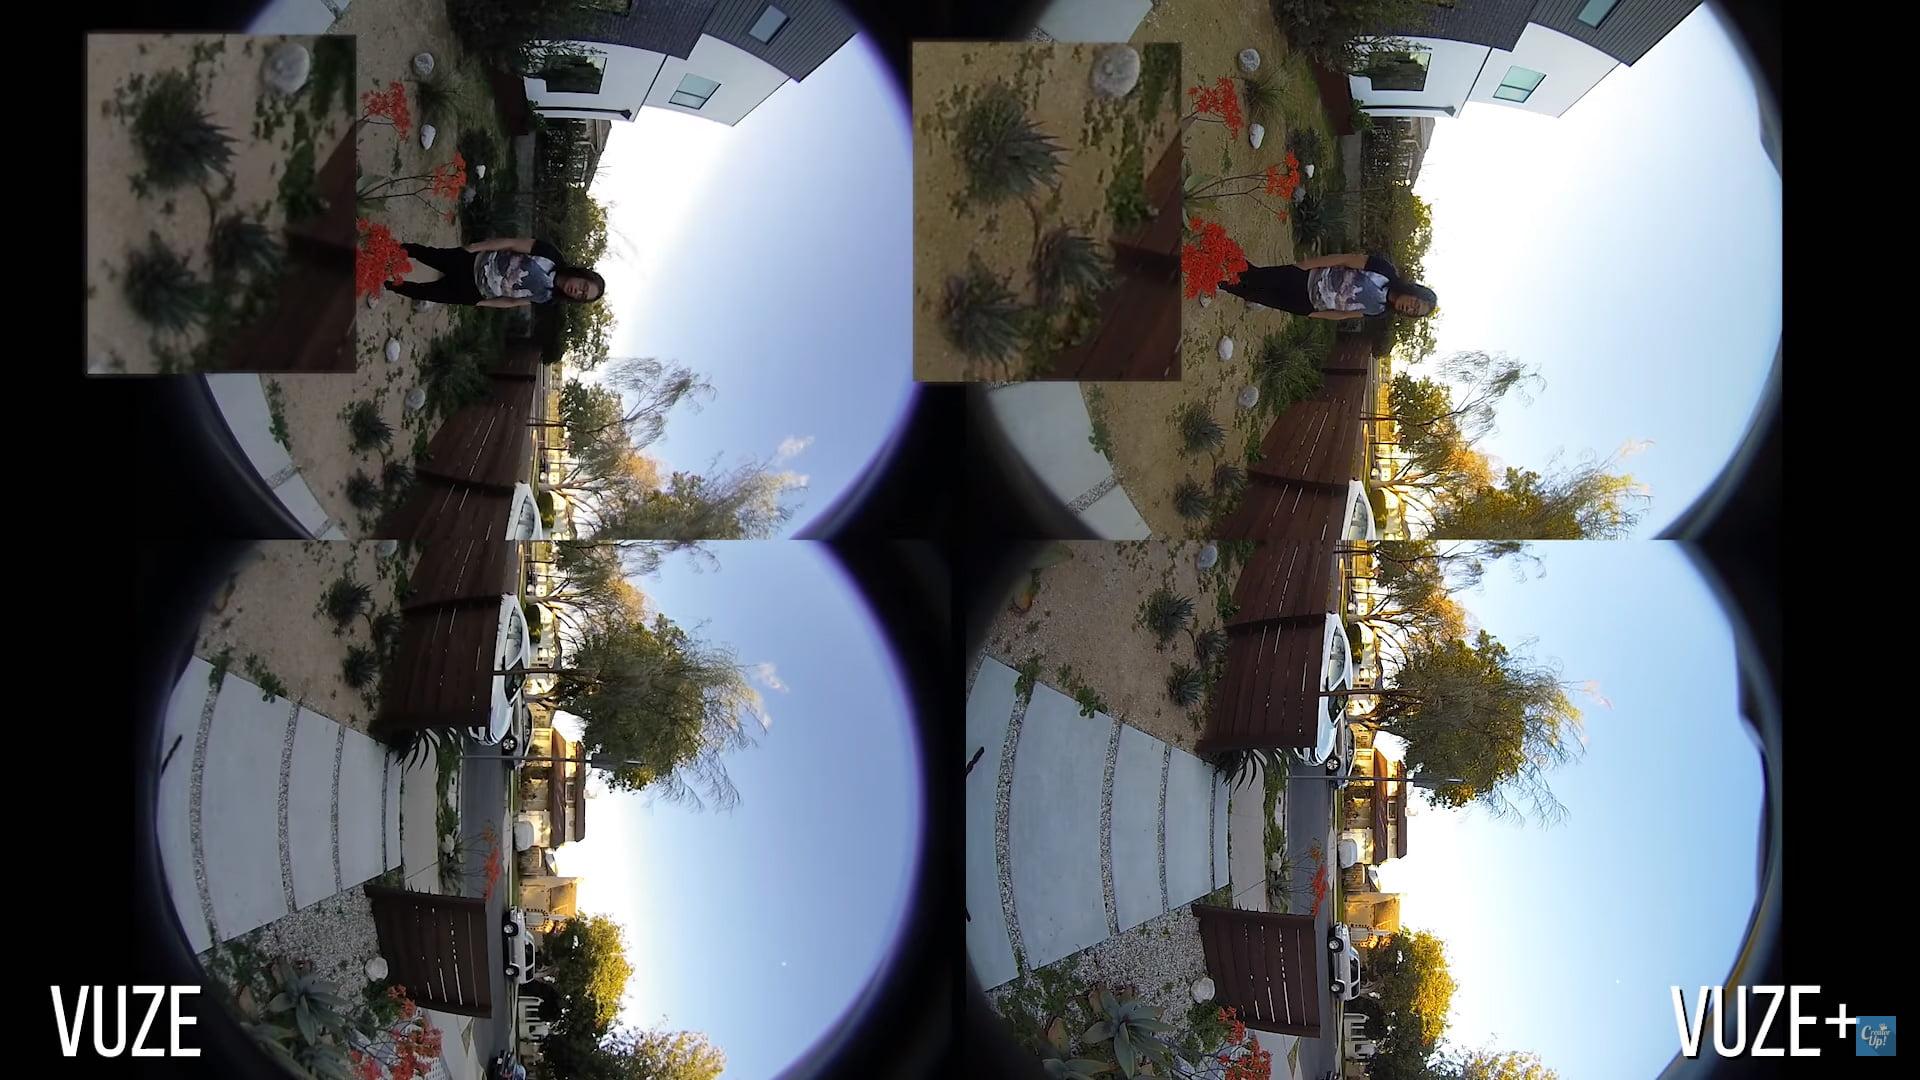 Links die normale Vuze-Kamera, rechts die neuen Vuze-Linsen. Bild: CreatorUp!, YouTube-Screenshot